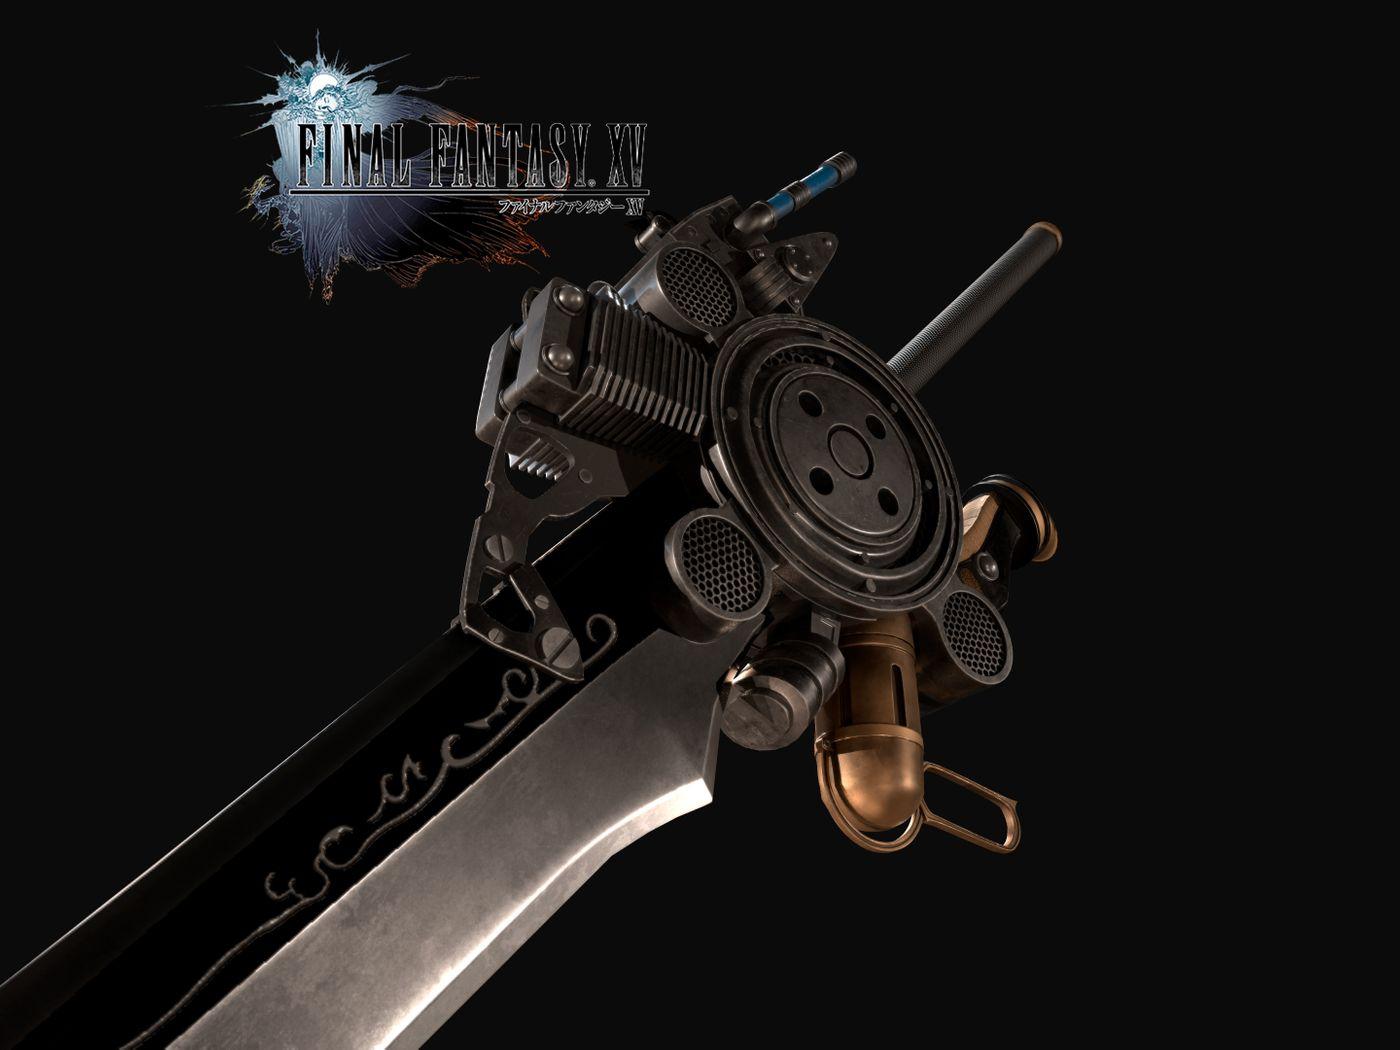 FF XV Engine Sword Fanart